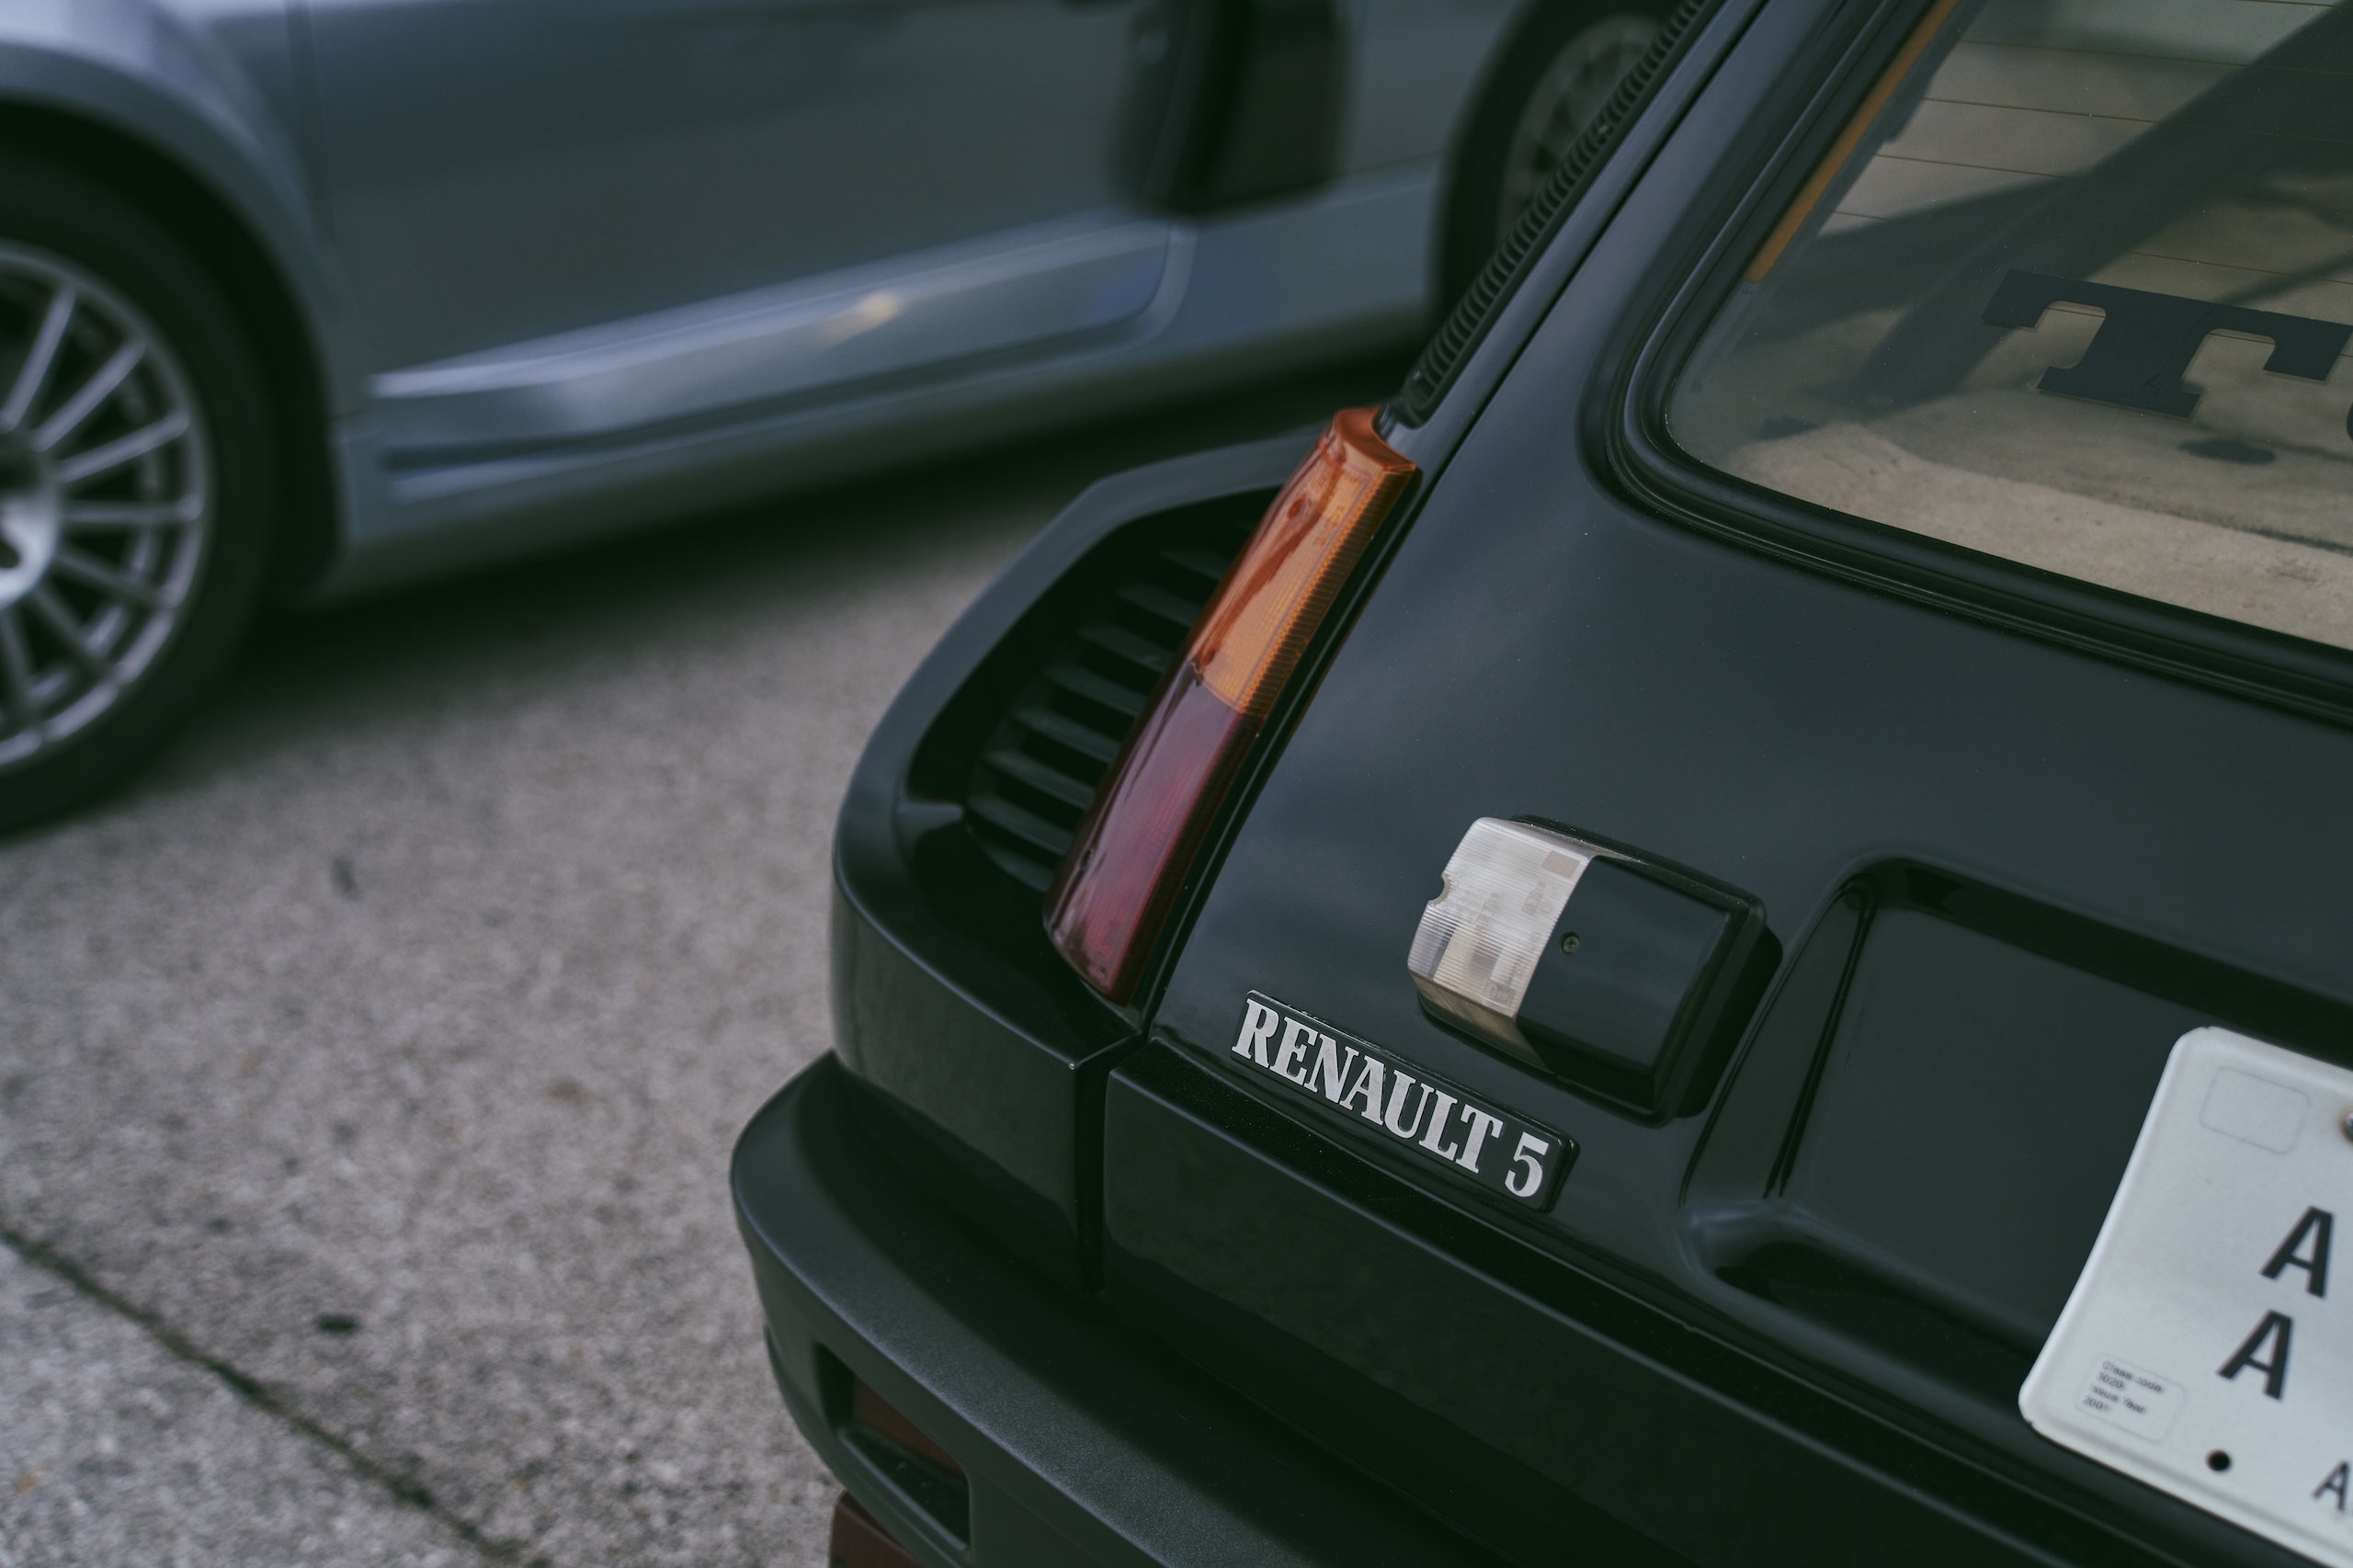 1985 Renault R5 Turbo 2 rear badge